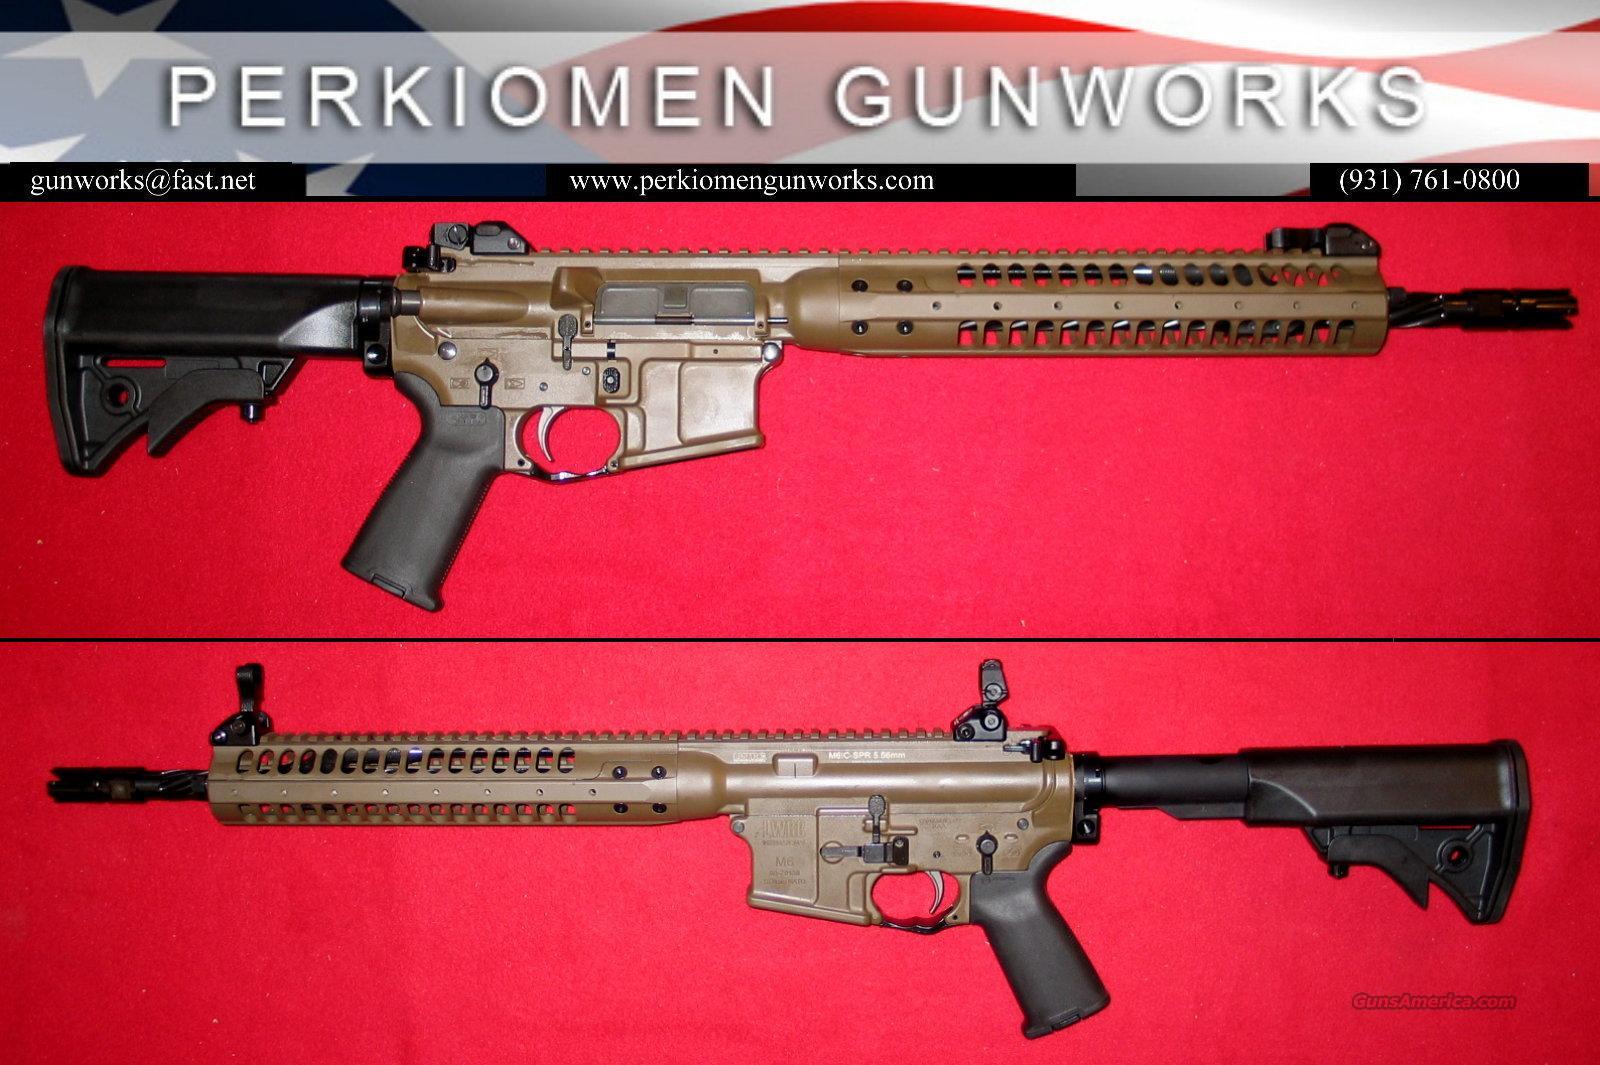 "LWRC M6A2 SPR, 5.56, 14.7"", Patriot Brown, NIB / Final Close-Out Price.  Guns > Rifles > AR-15 Rifles - Small Manufacturers > Complete Rifle"